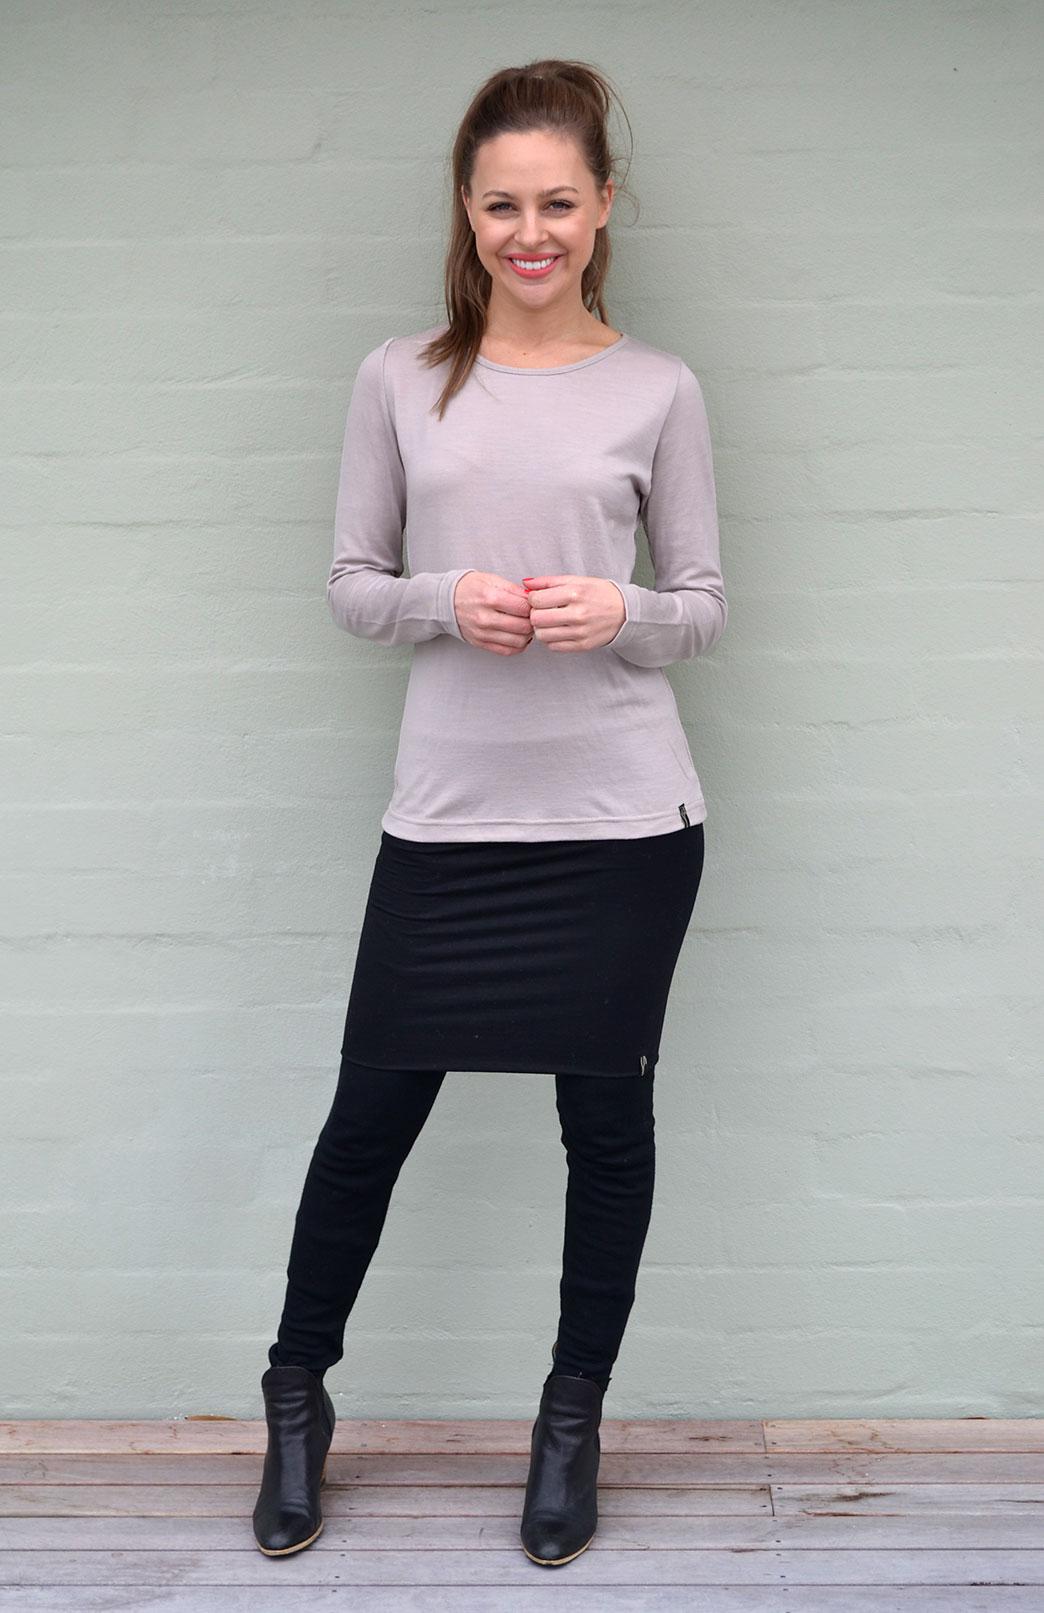 Round Neck Top - Plain - Women's Natural Stone Long Sleeved Merino Wool Thermal Top - Smitten Merino Tasmania Australia